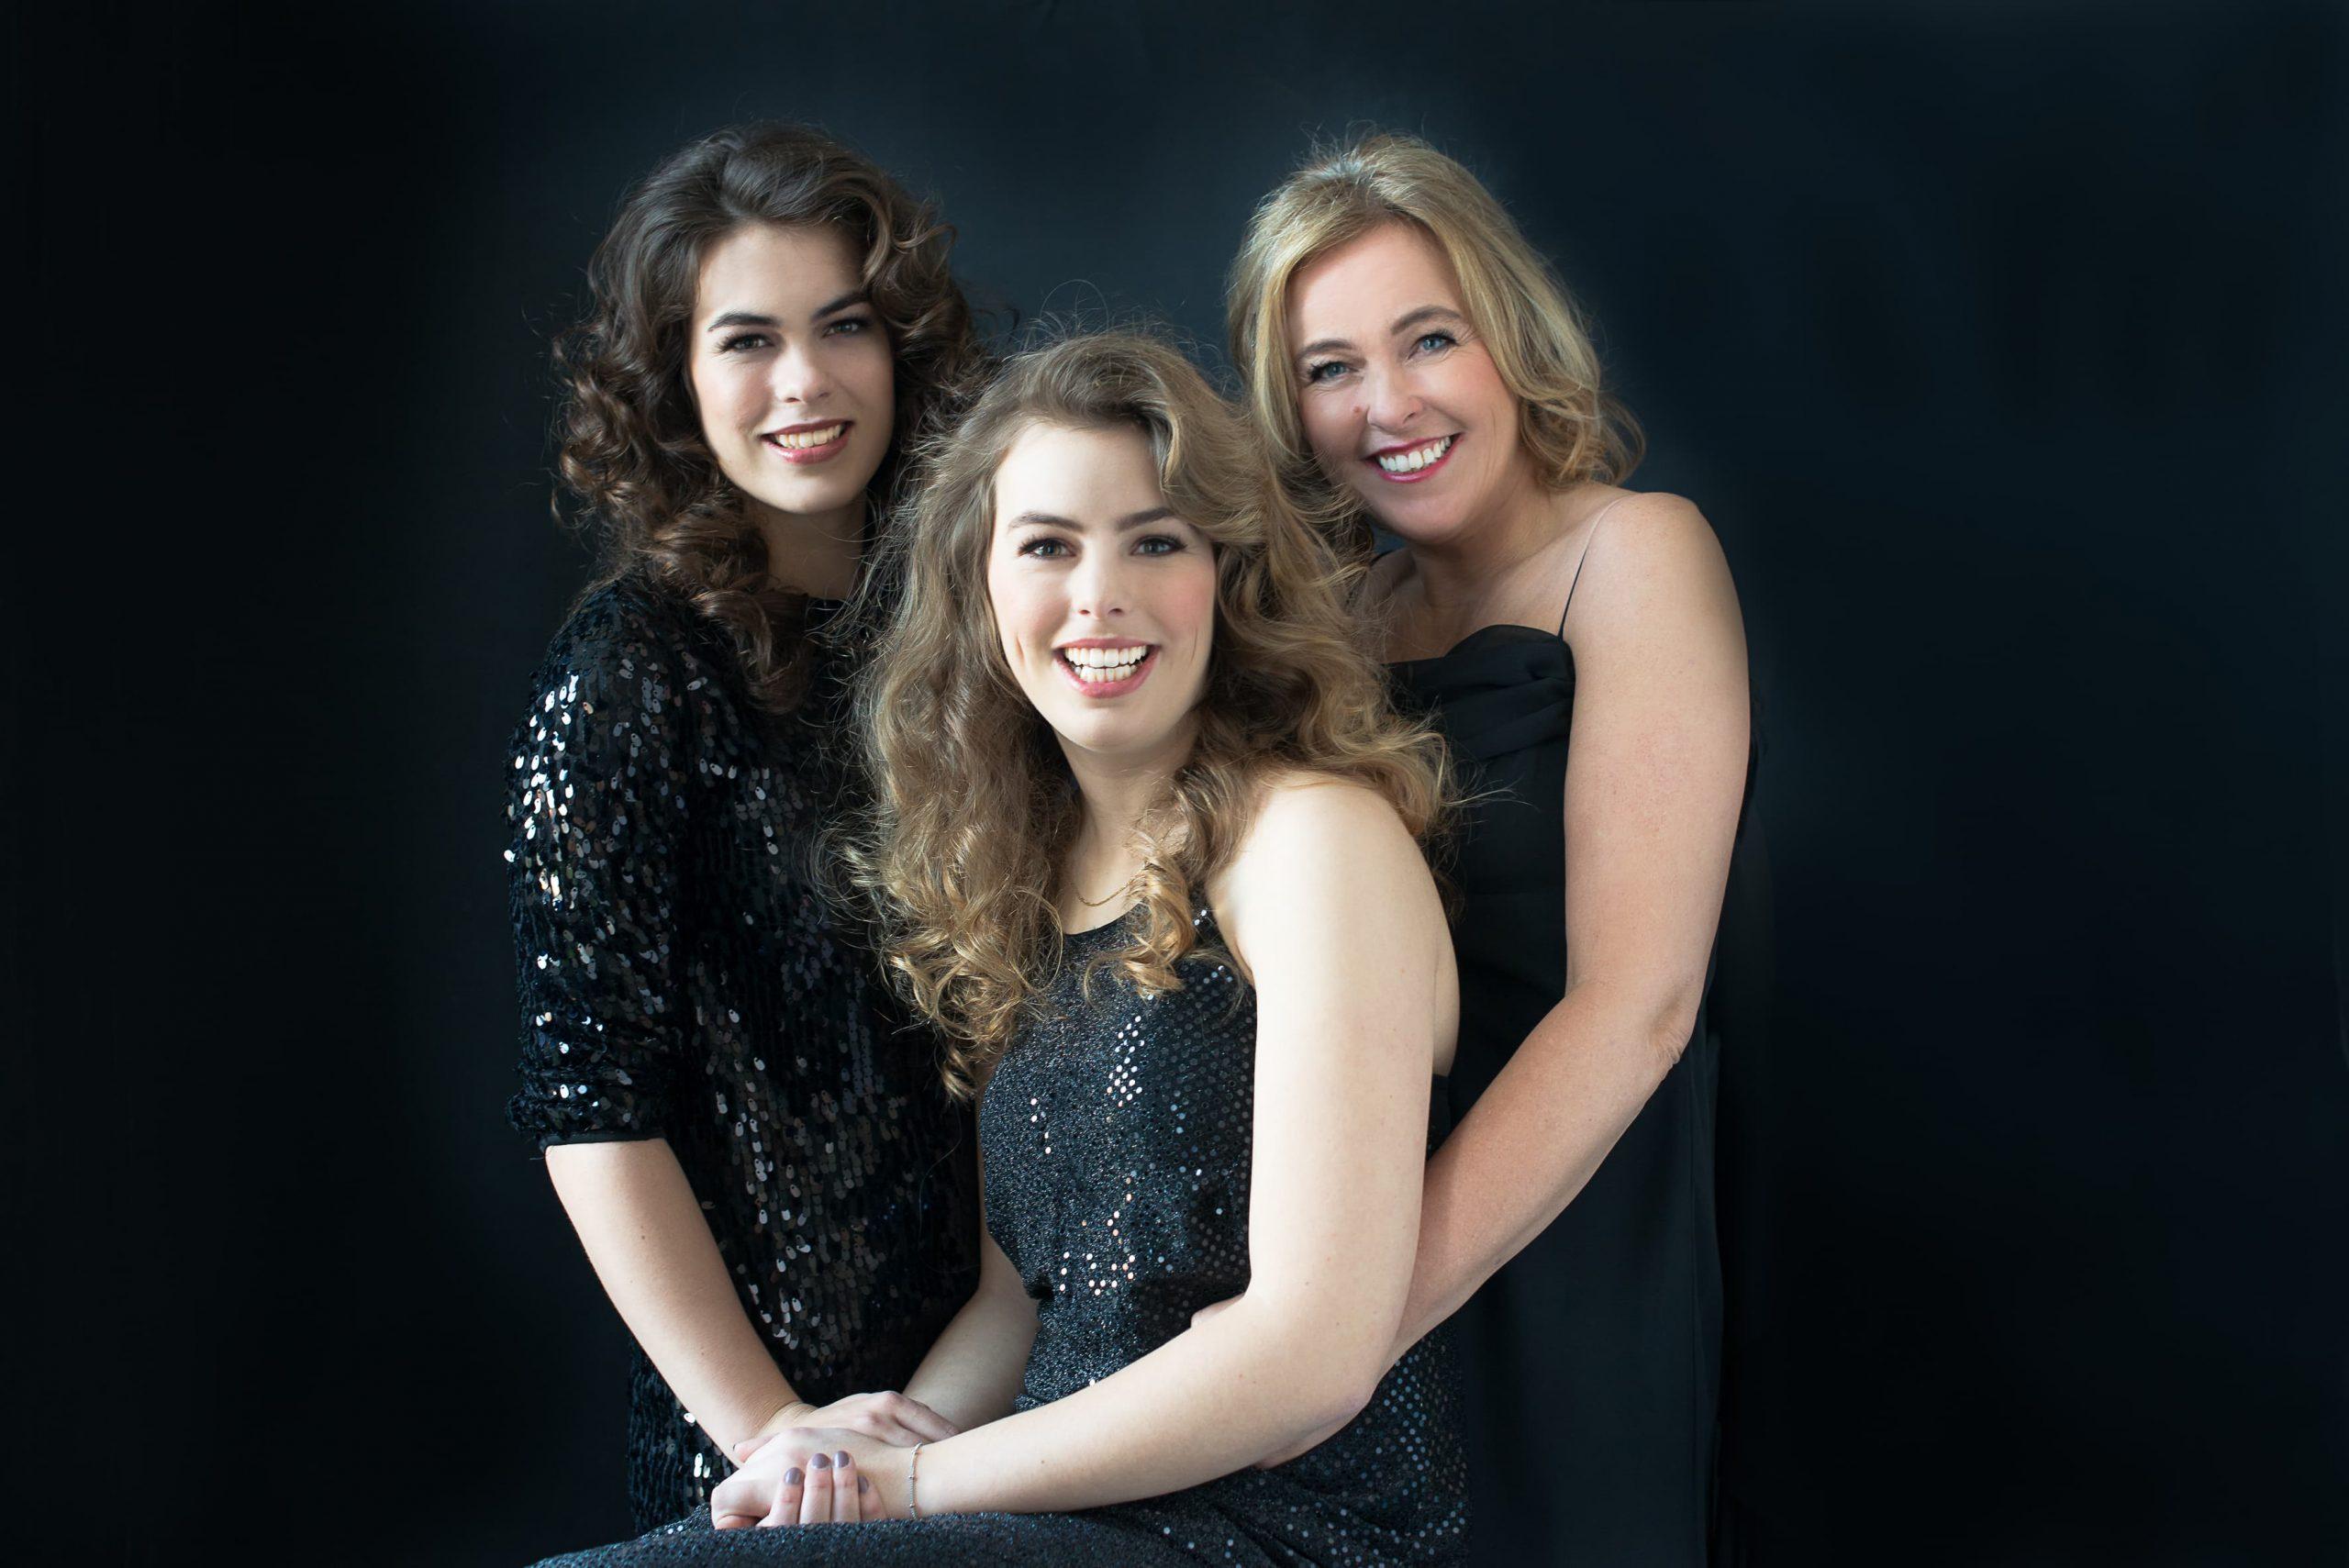 Family Portraits all black black on black fotoshoot